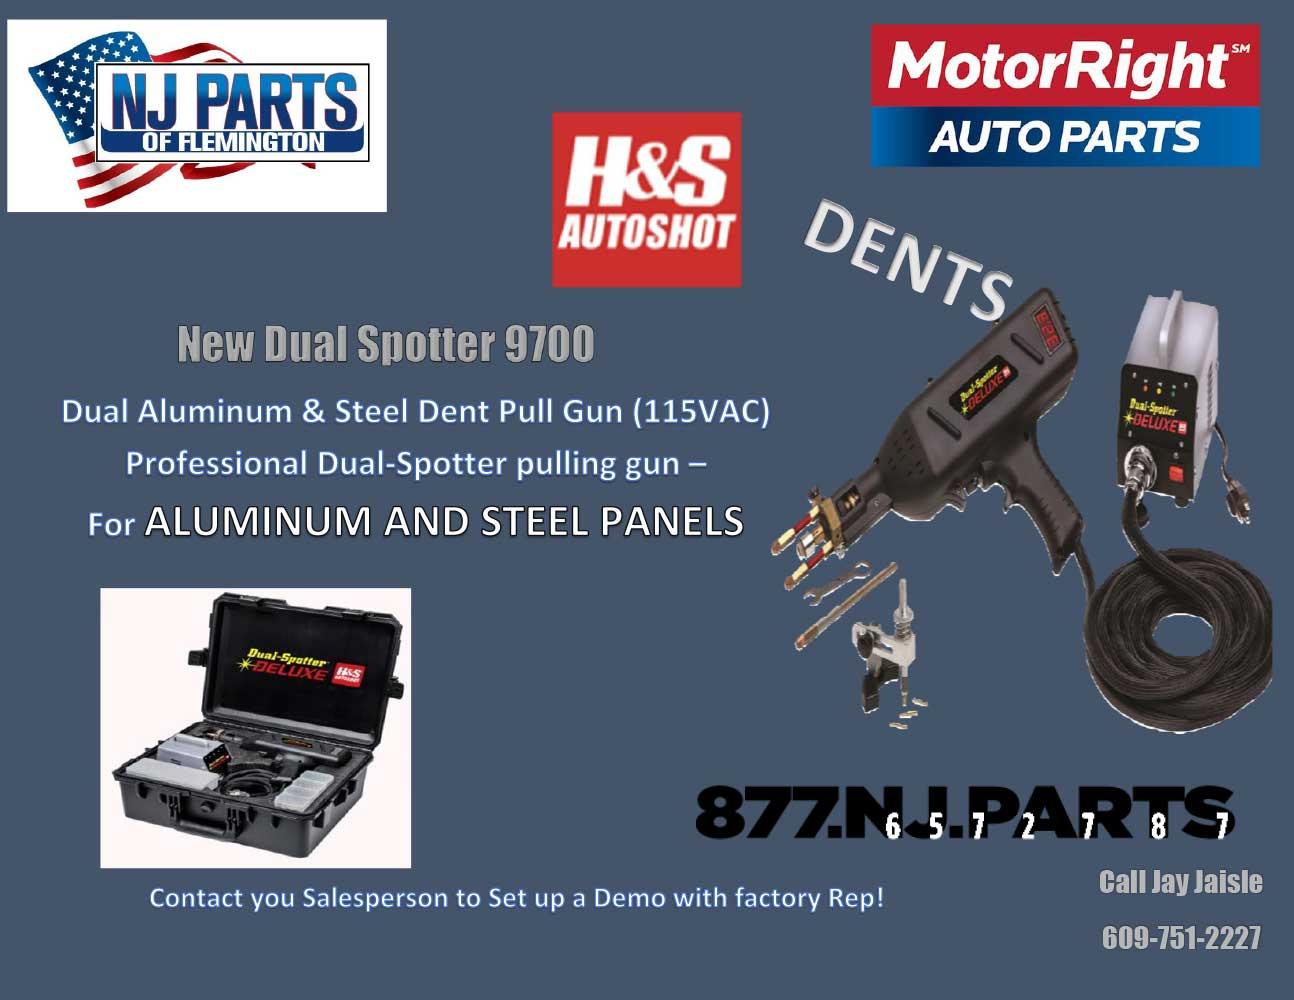 New-Dual-Spotter-9700-website-Ad.jpg